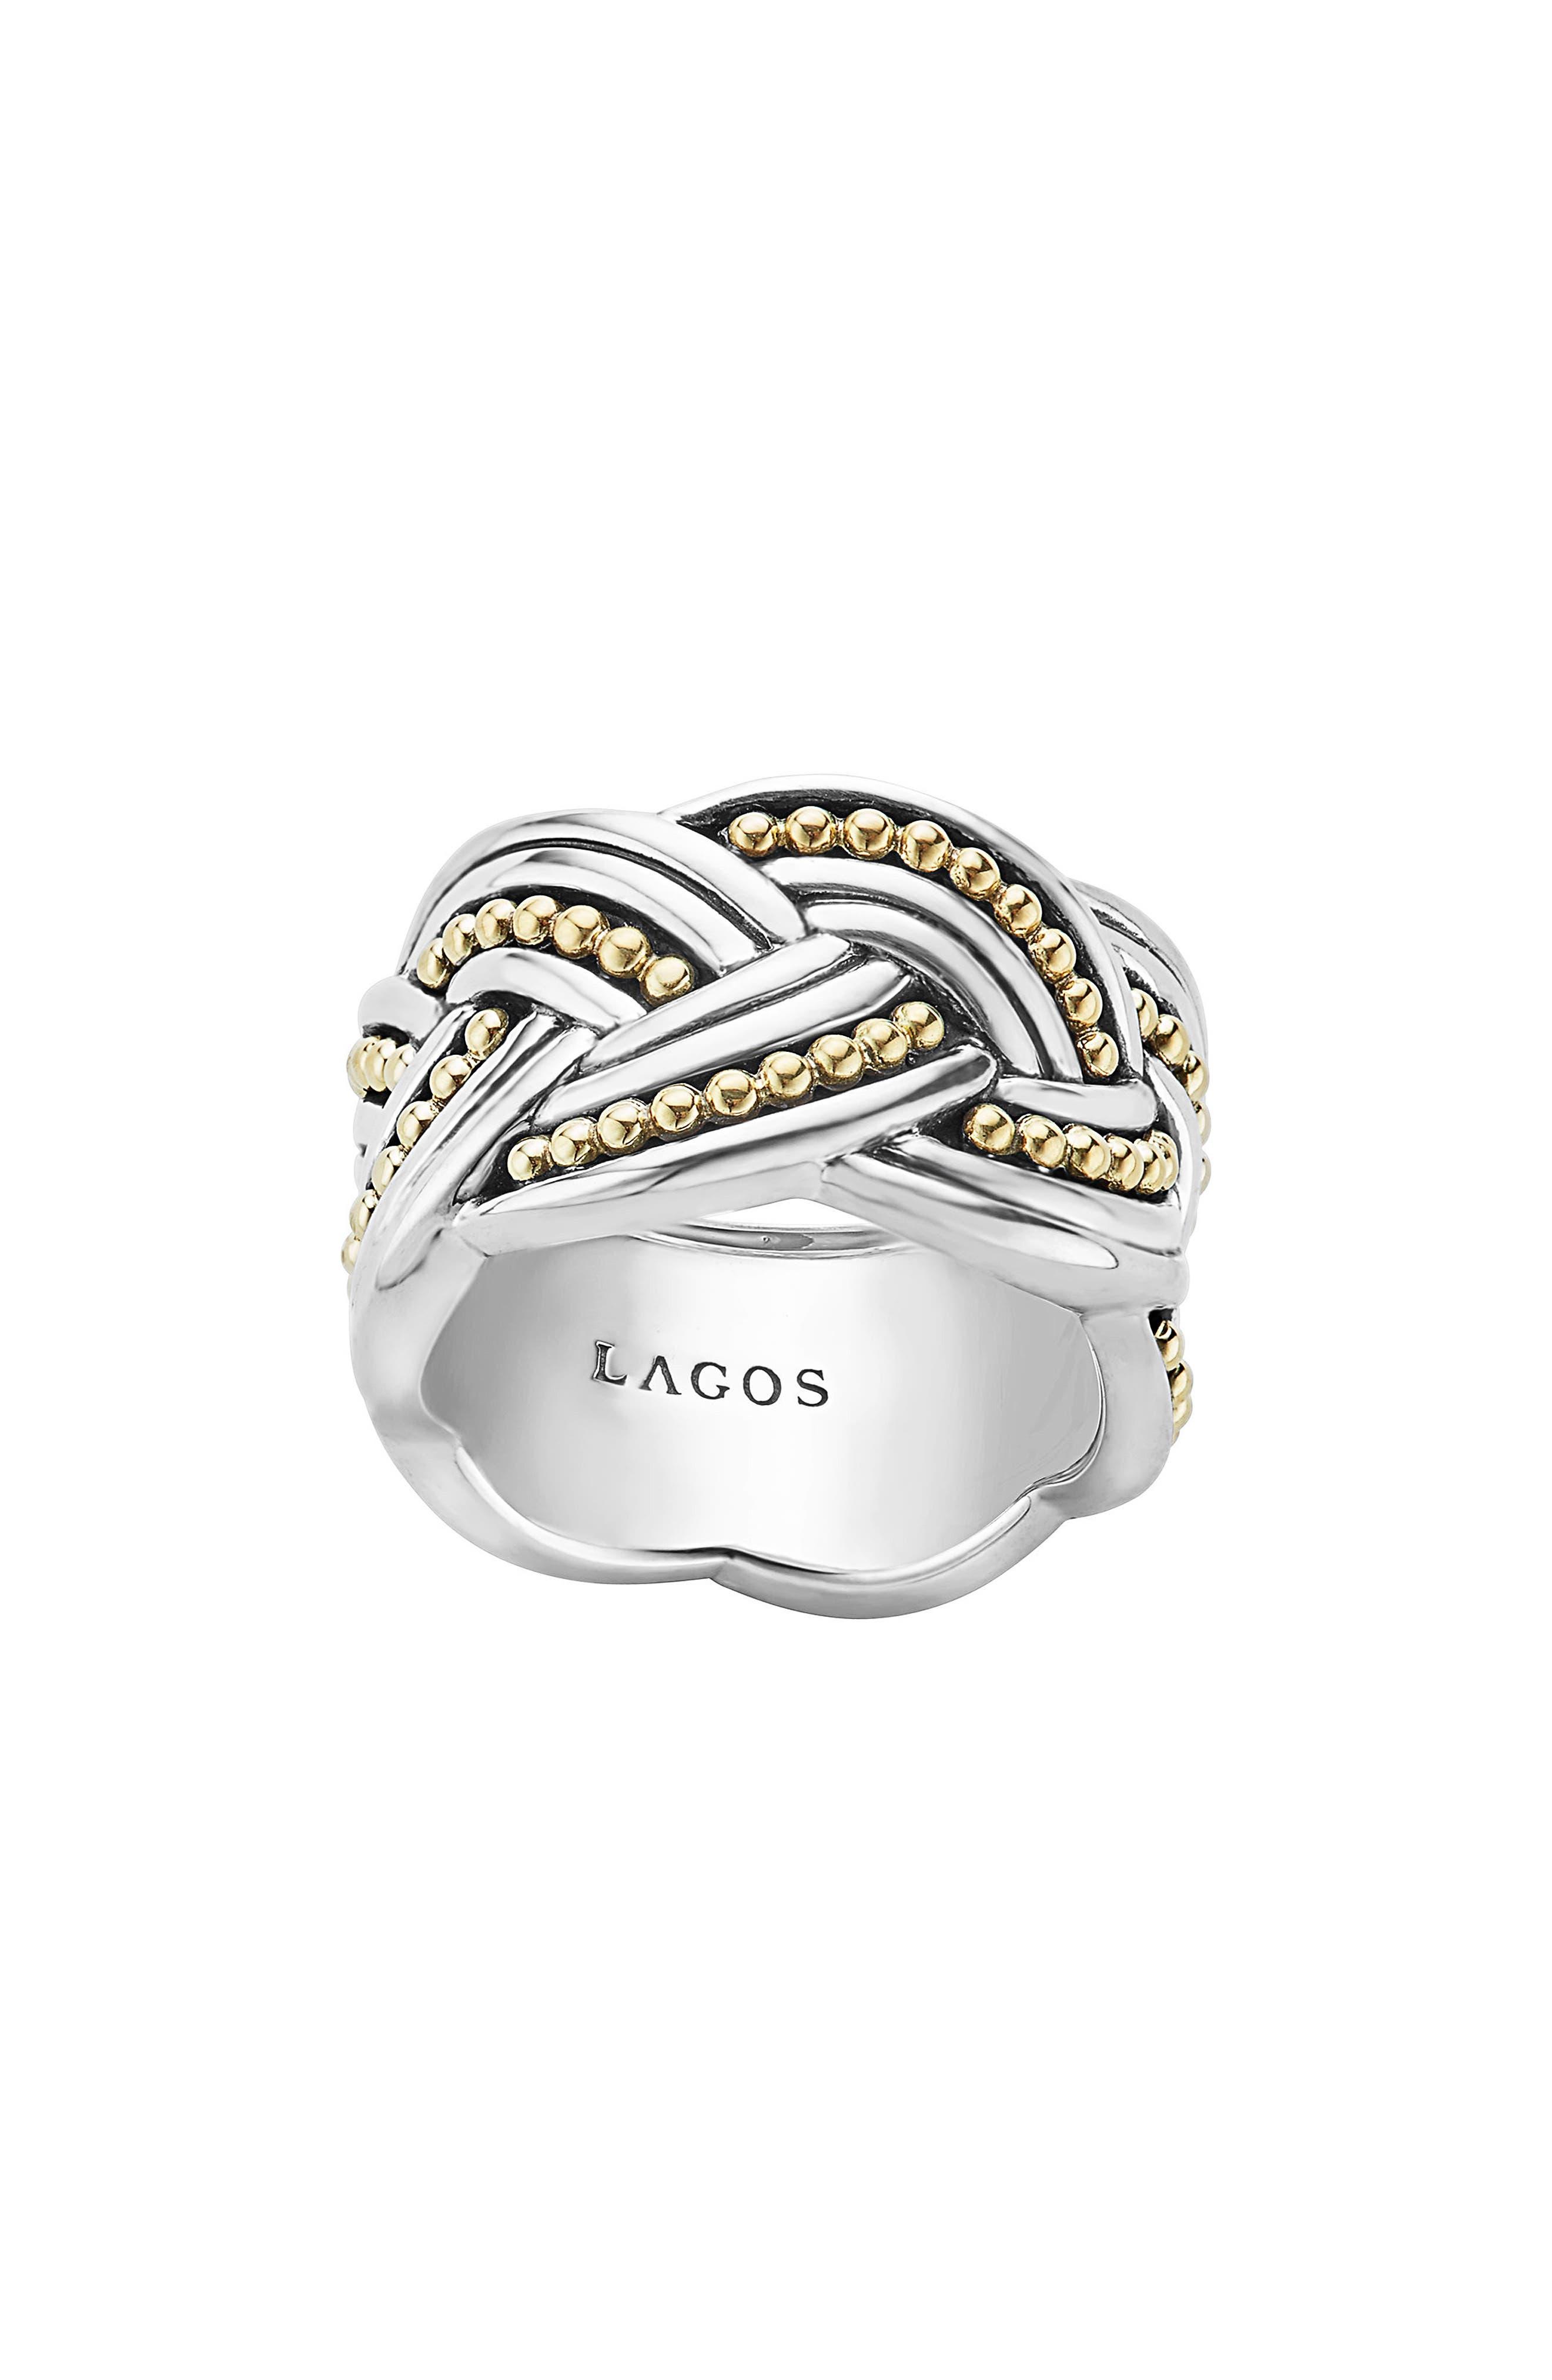 Torsade Knot Ring,                             Alternate thumbnail 3, color,                             Silver/ Gold